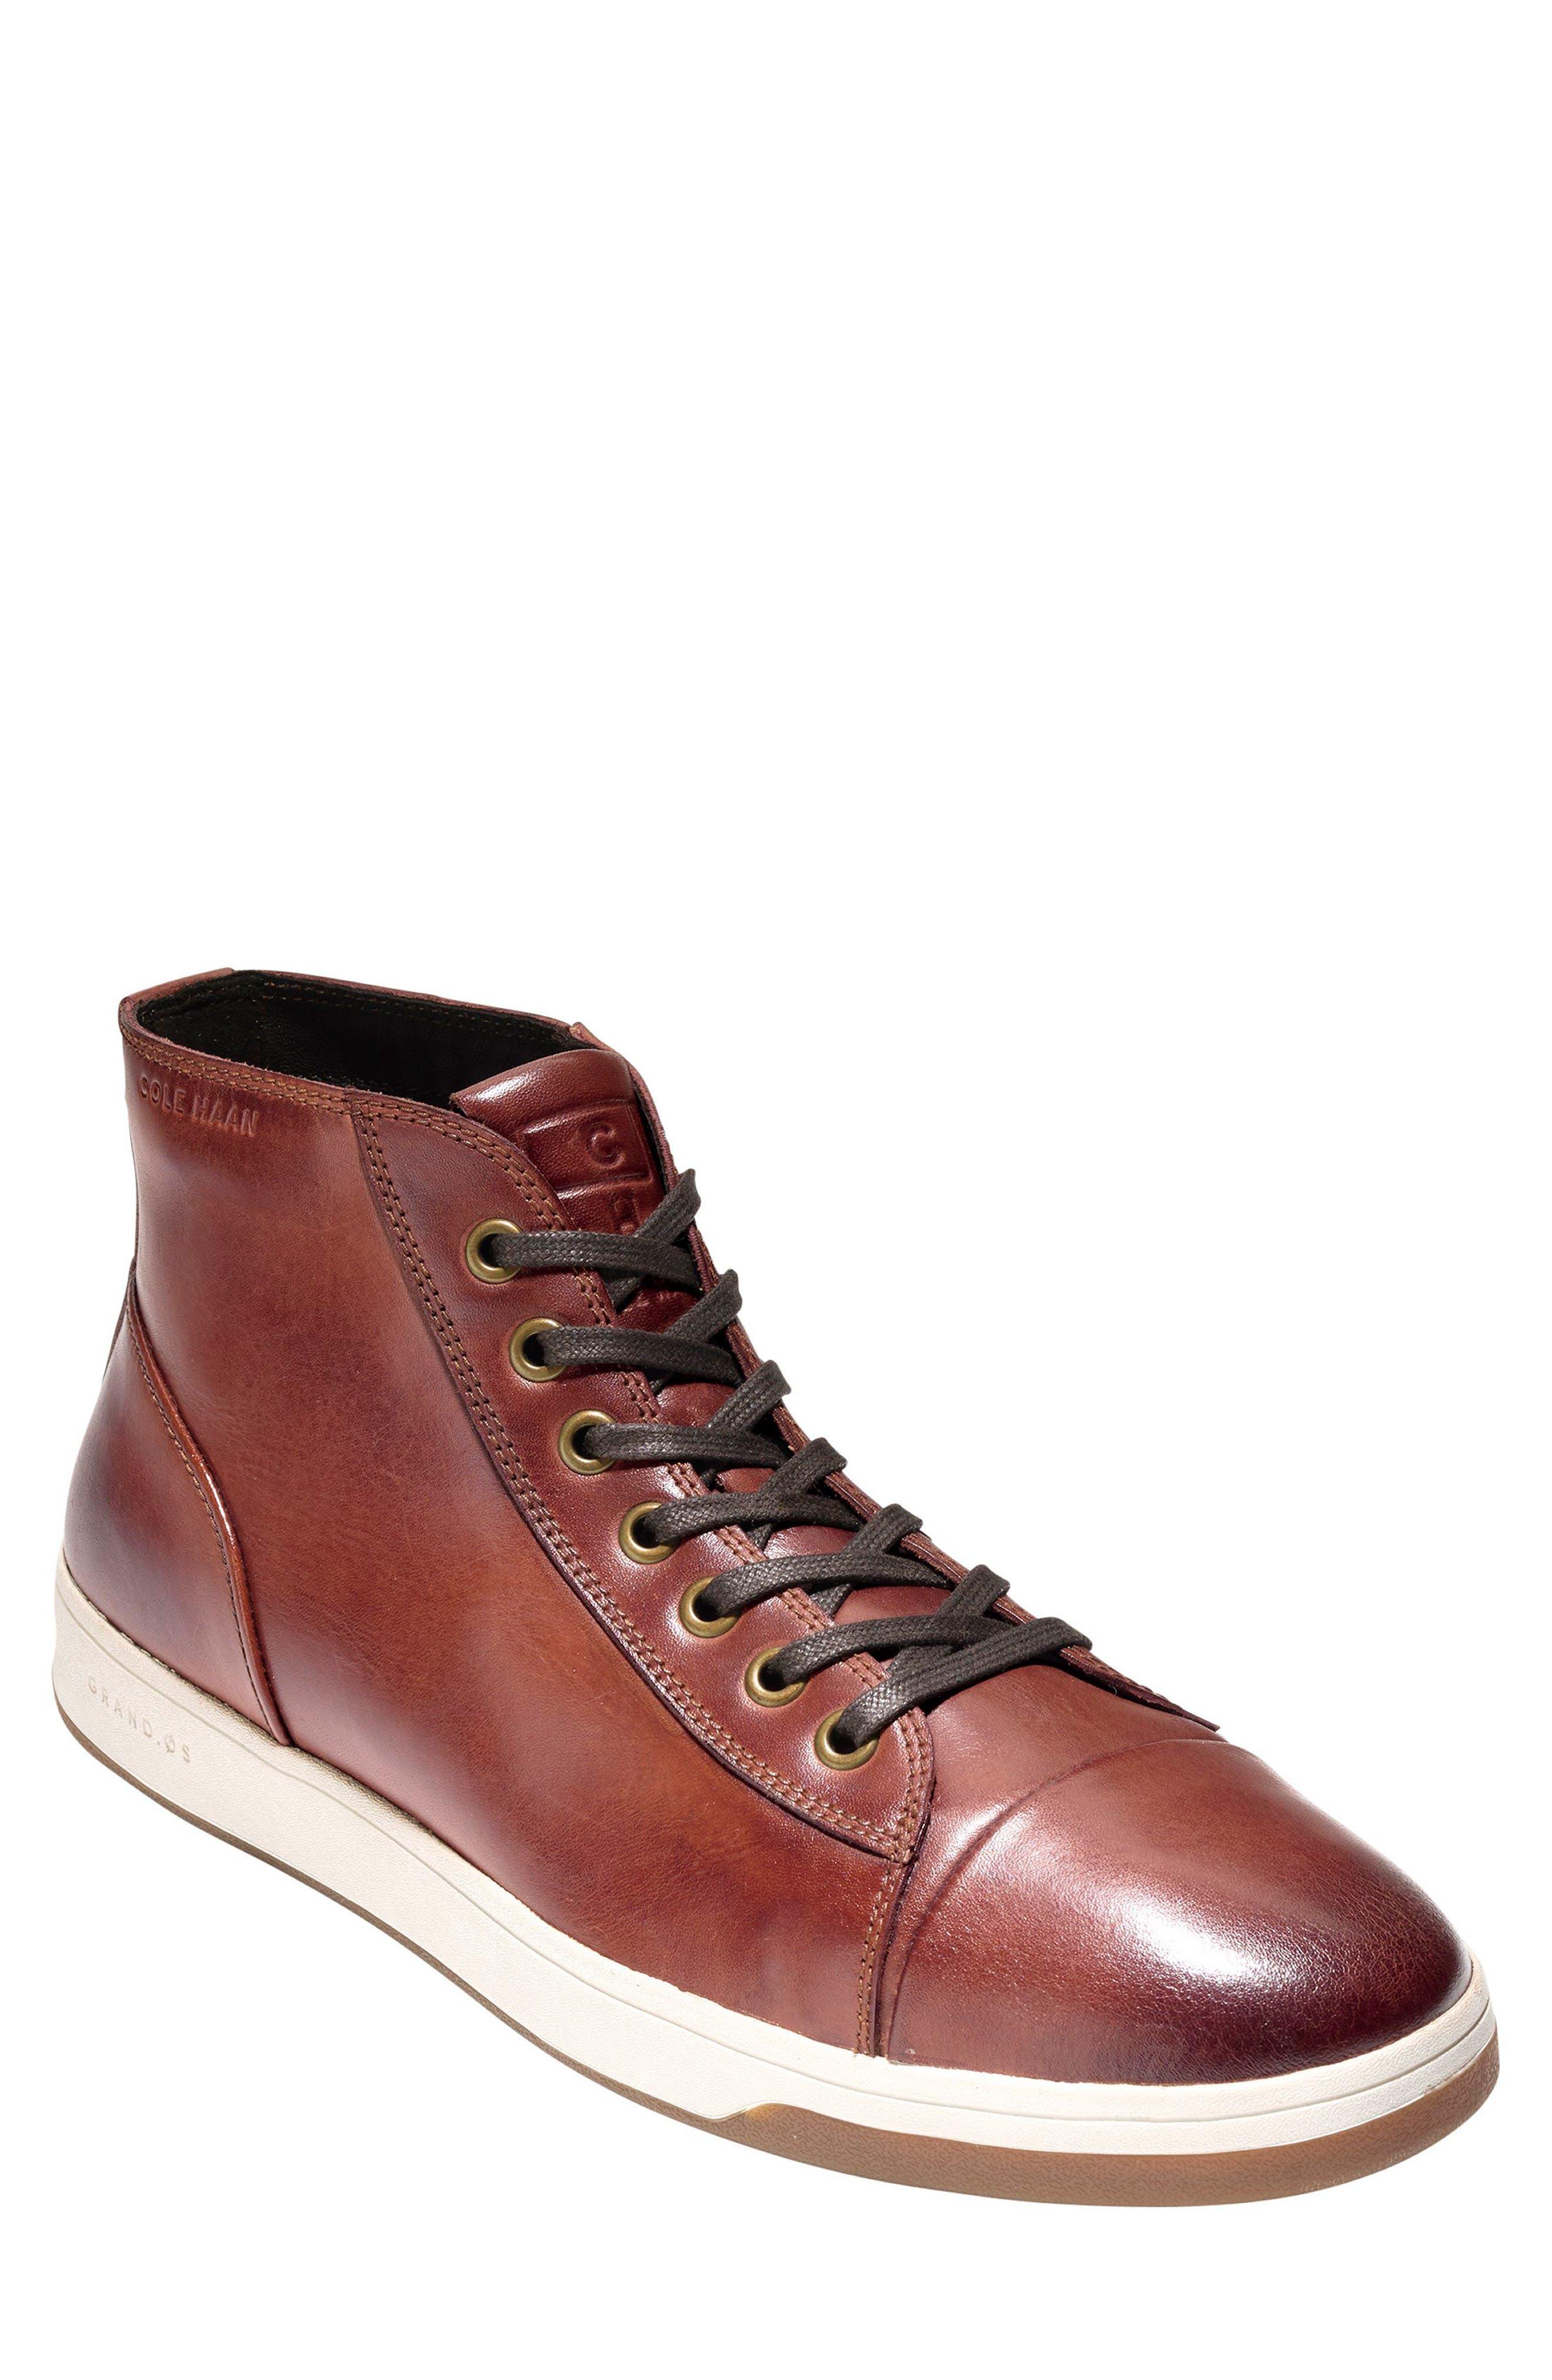 GrandPro High Top Sneaker,                             Main thumbnail 1, color,